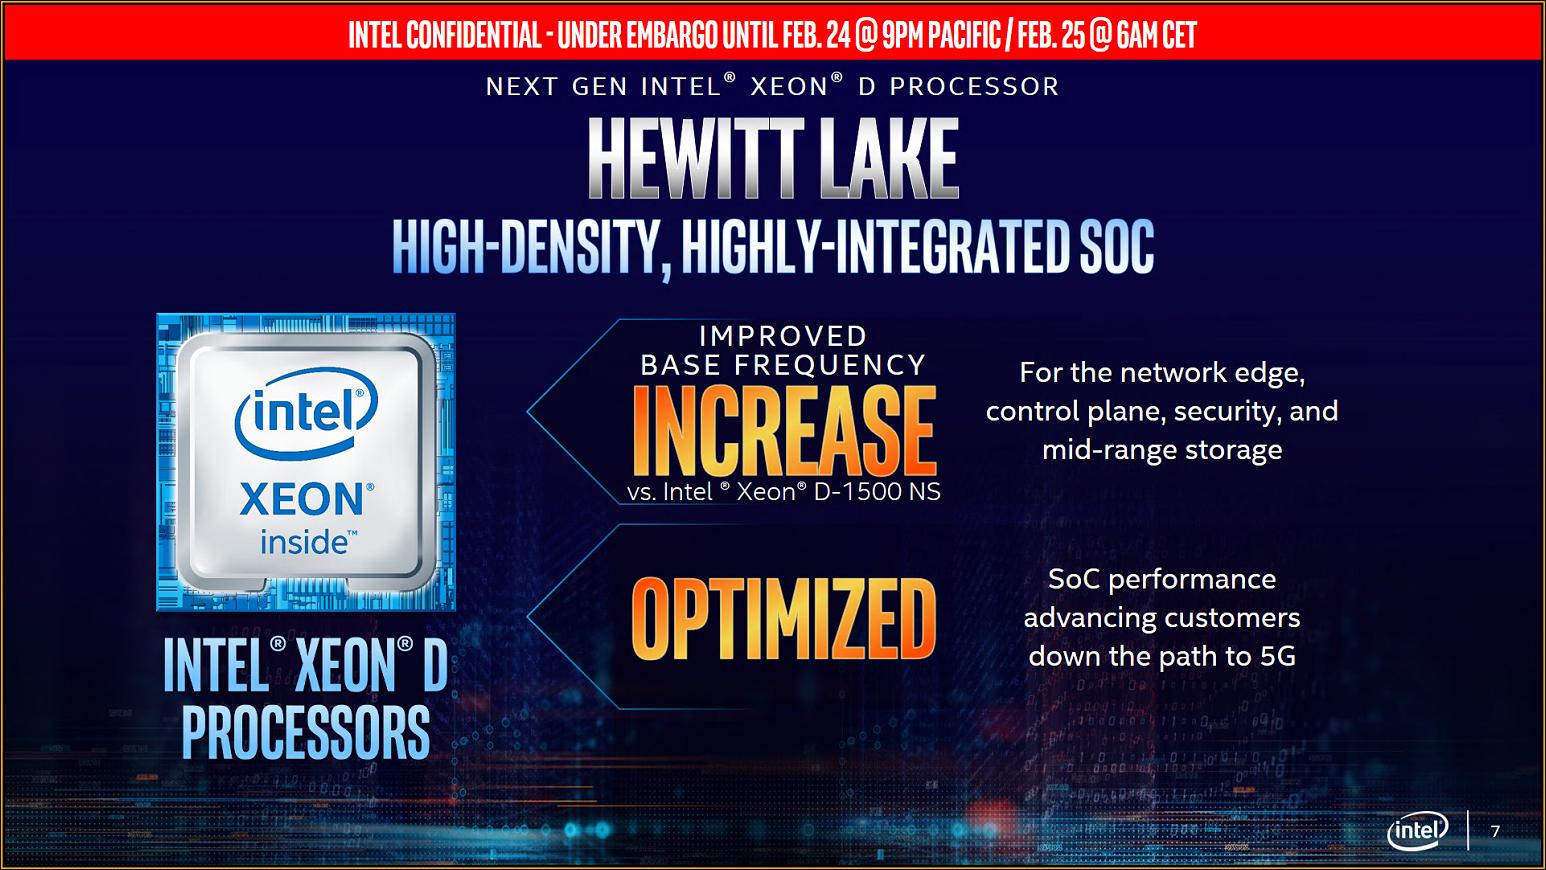 Hewitt Lake: Intel benennt kommende Generation der Xeon D -